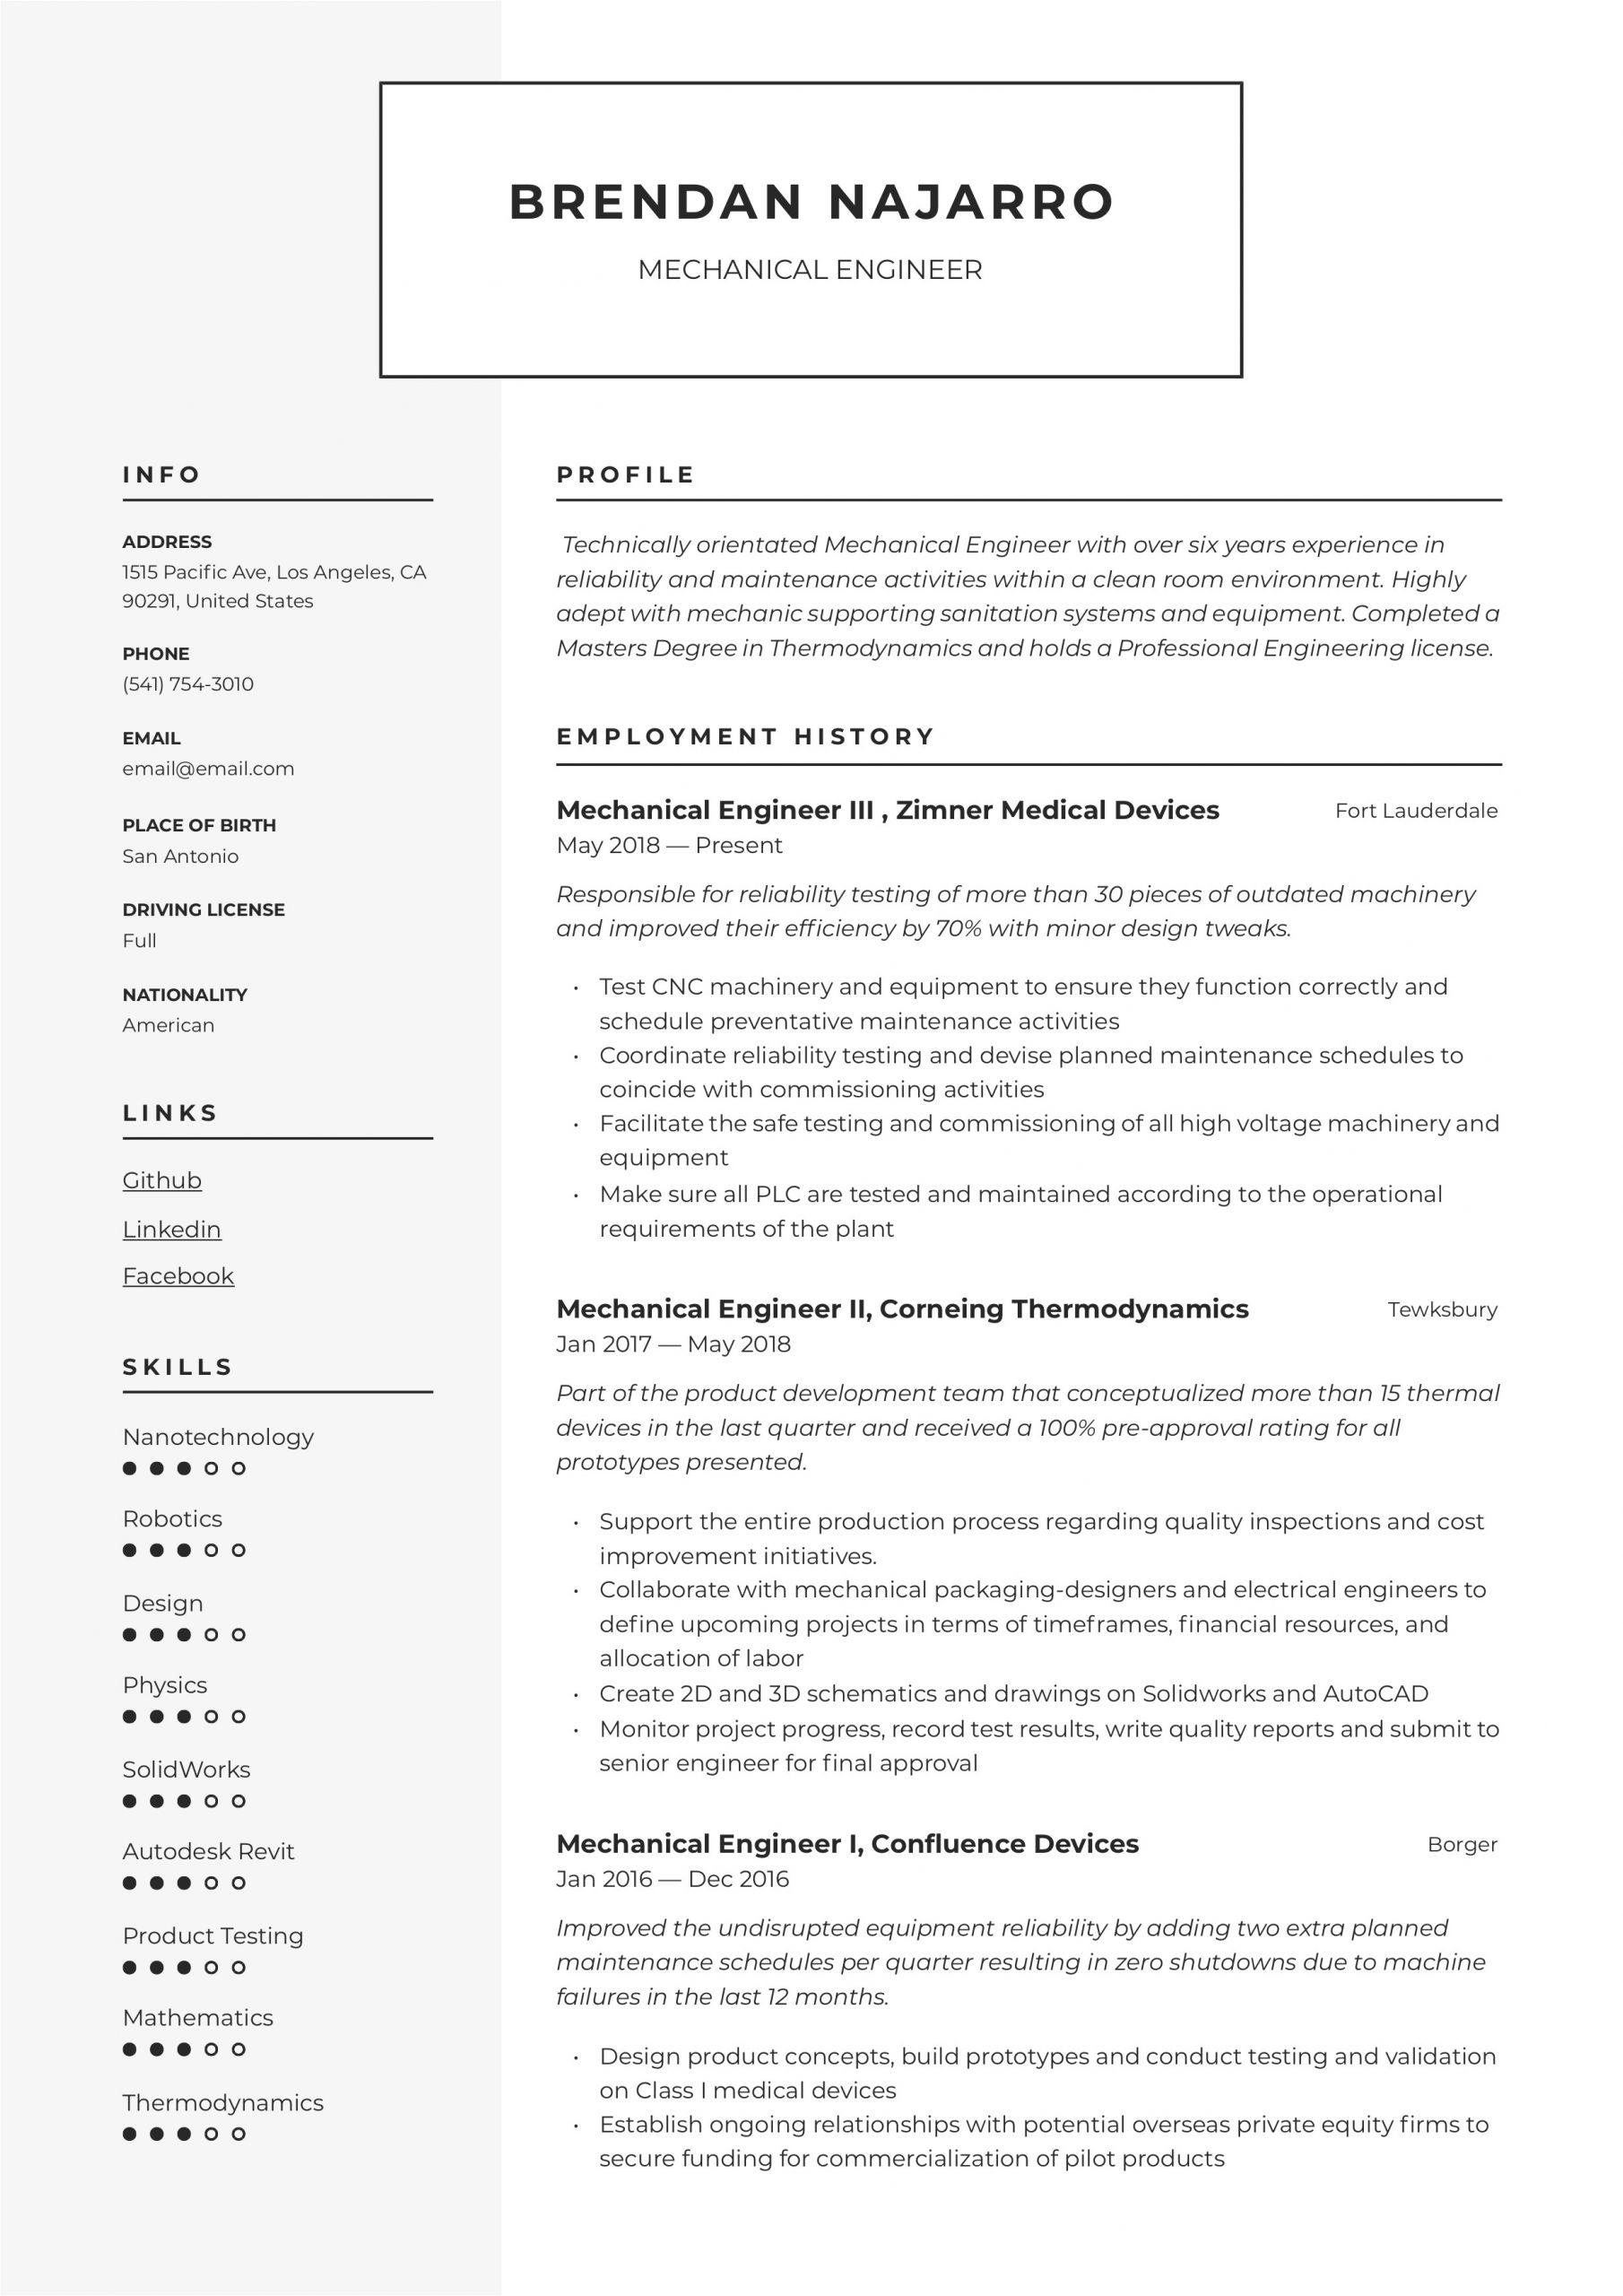 Engineer Resume Guide Mechanical Engineer Resume Writing Guide 12 Templates